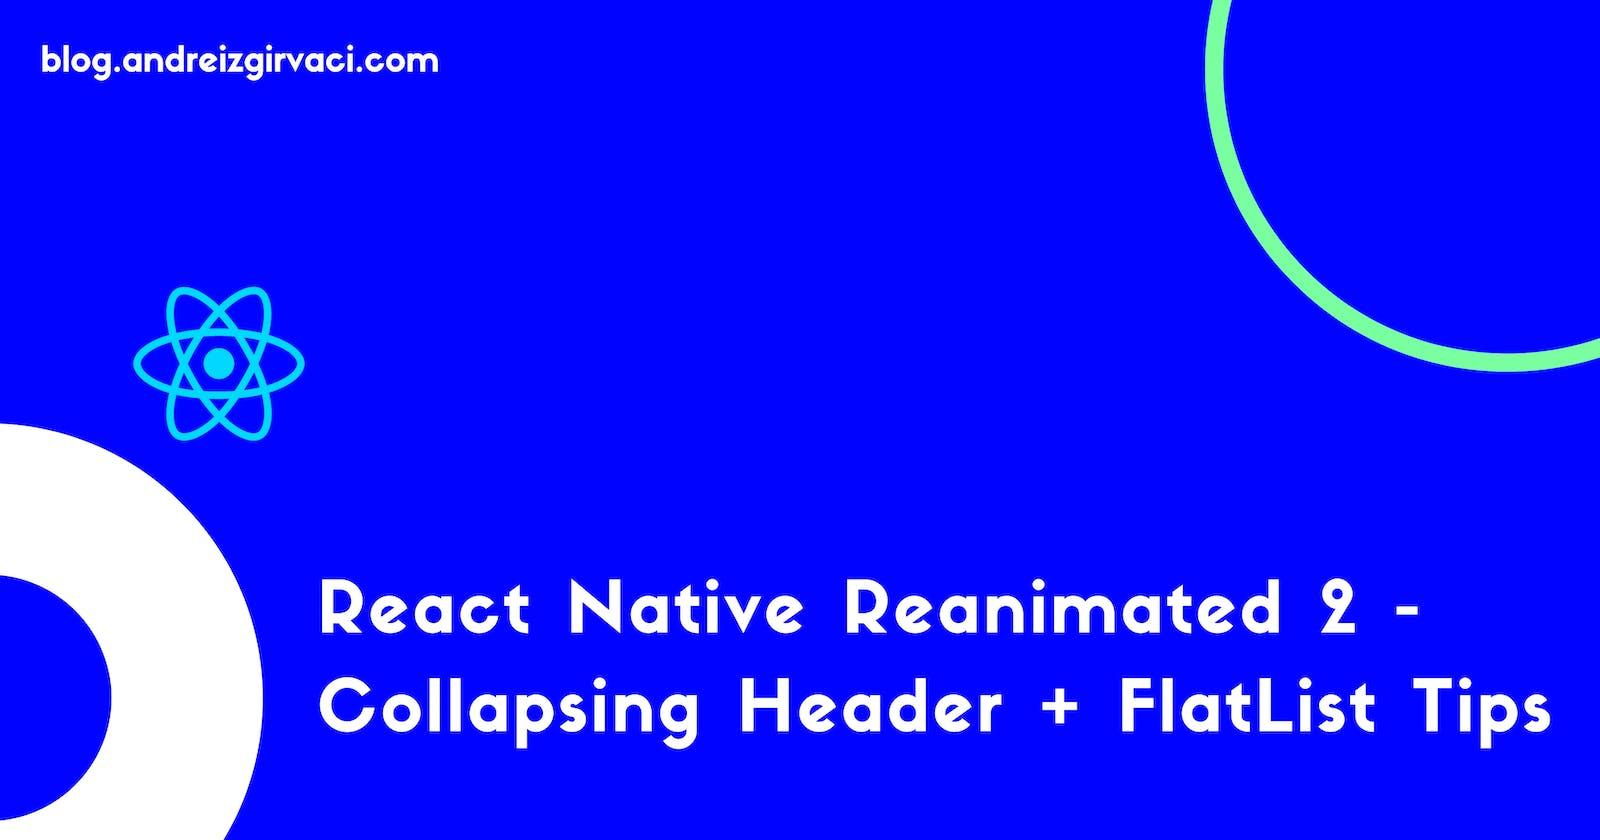 React Native Reanimated 2 - Collapsing Header + FlatList Tips